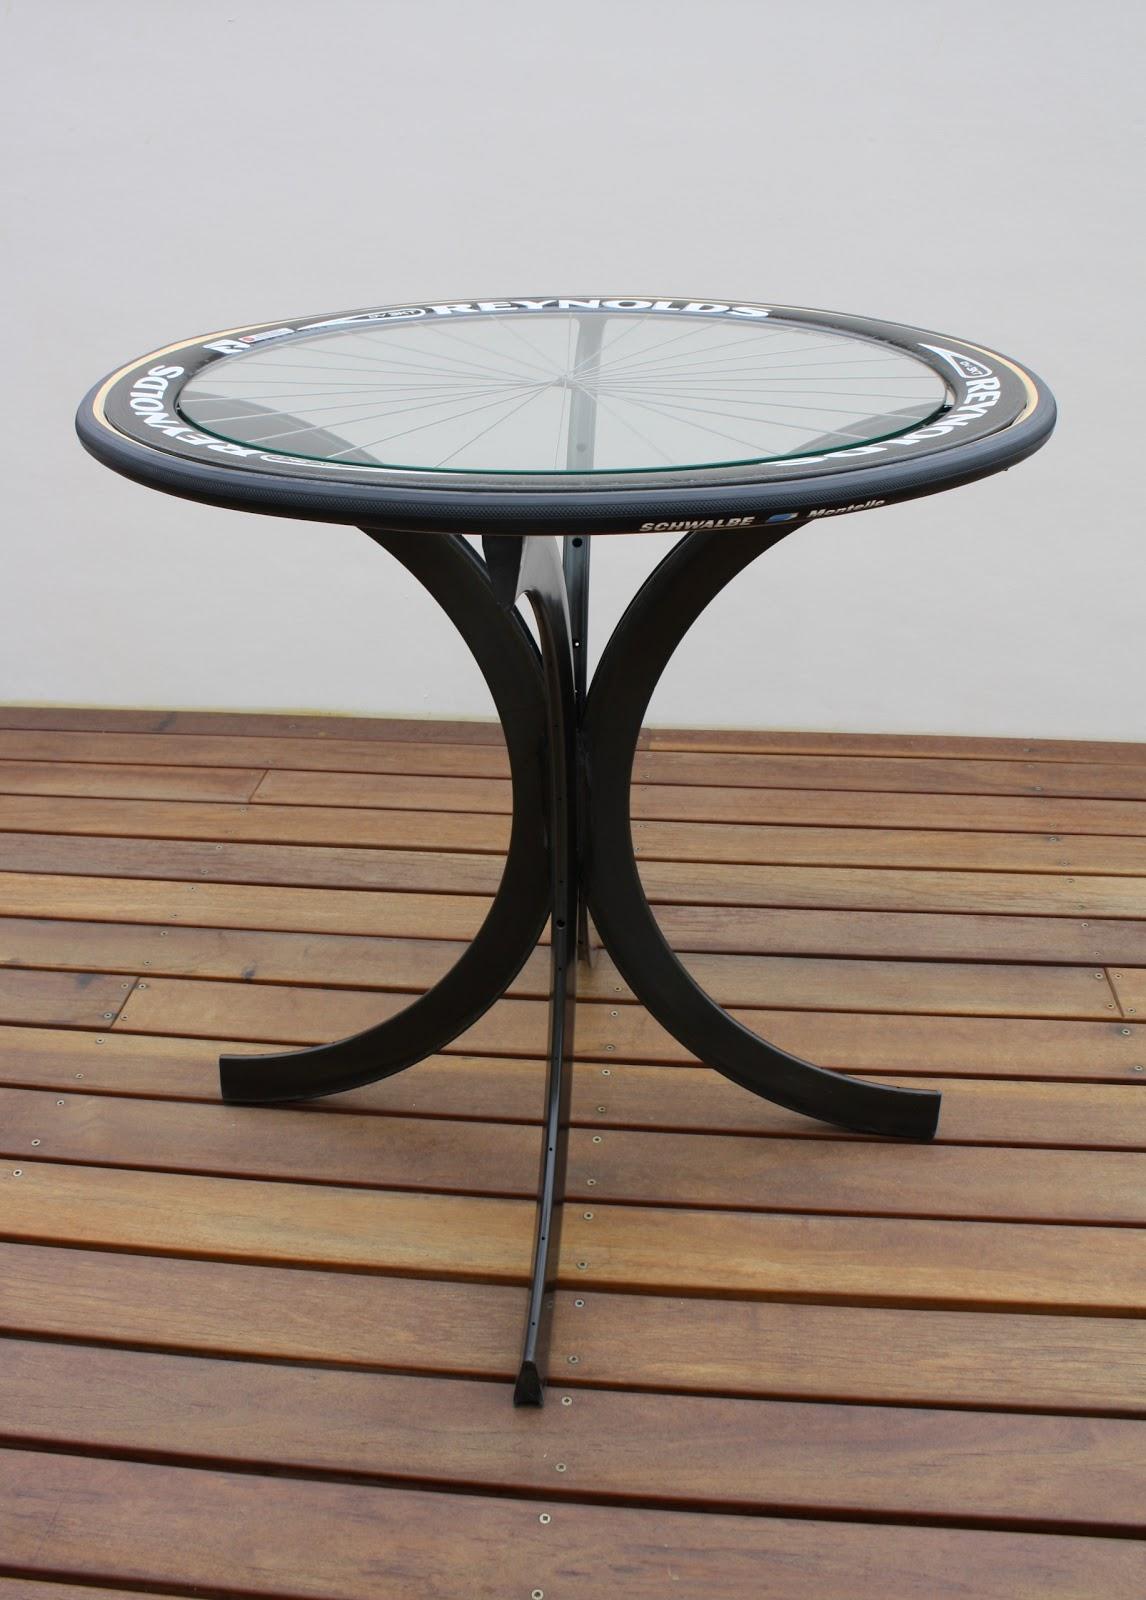 Carbon Footprint Design: Carbon fiber DV rim coffee table 807